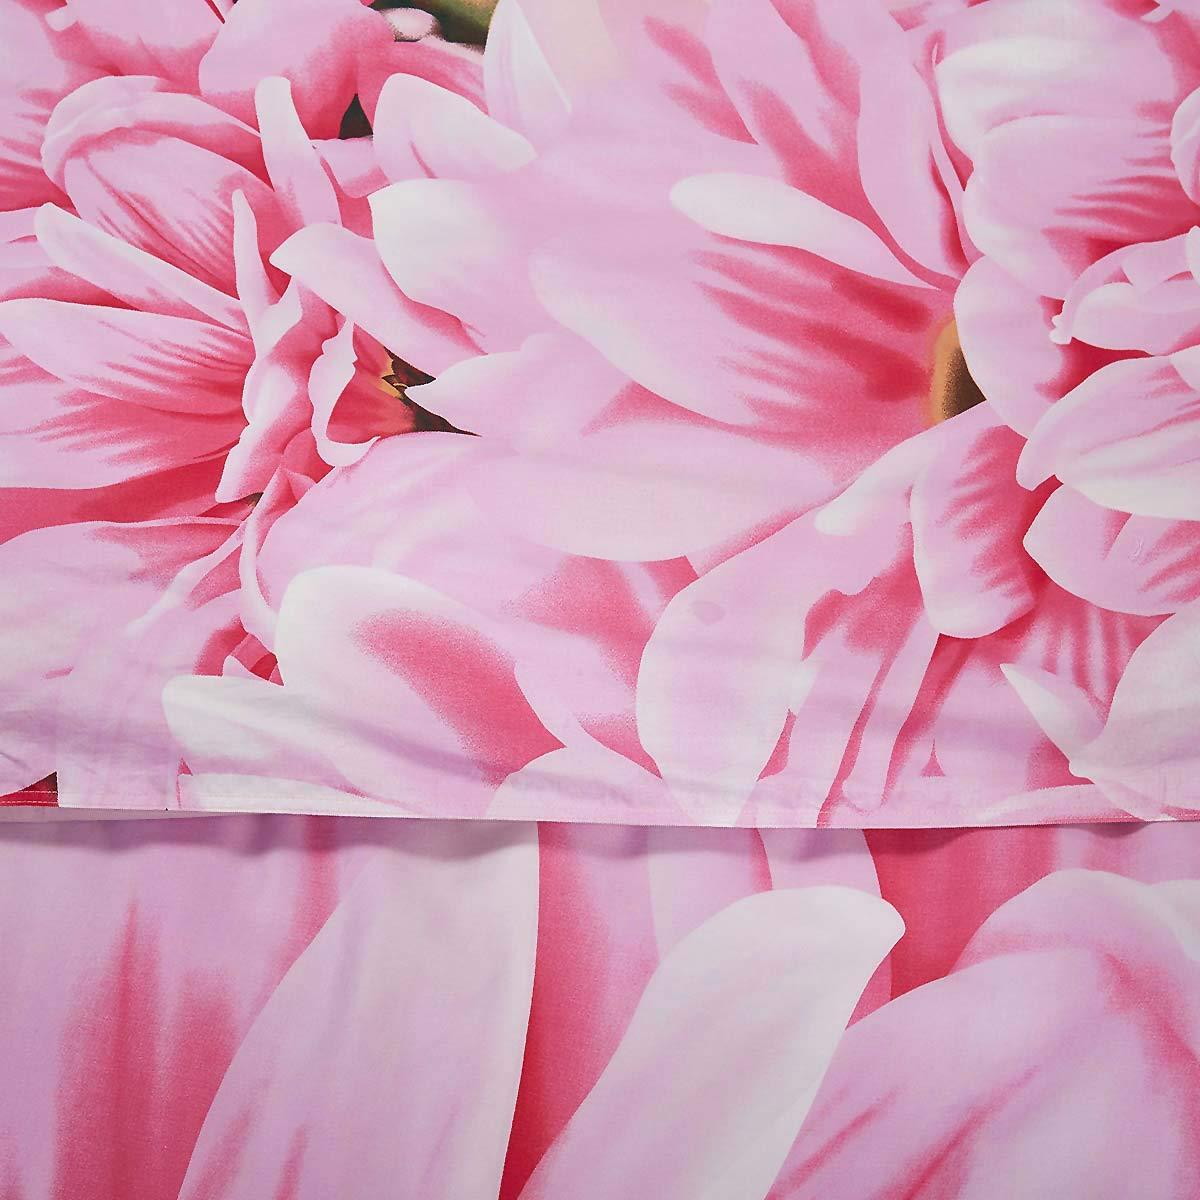 Kess InHouse Angelo Cerantola Jungle Lines Blue Pink Digital 23 x 23 Square Floor Pillow